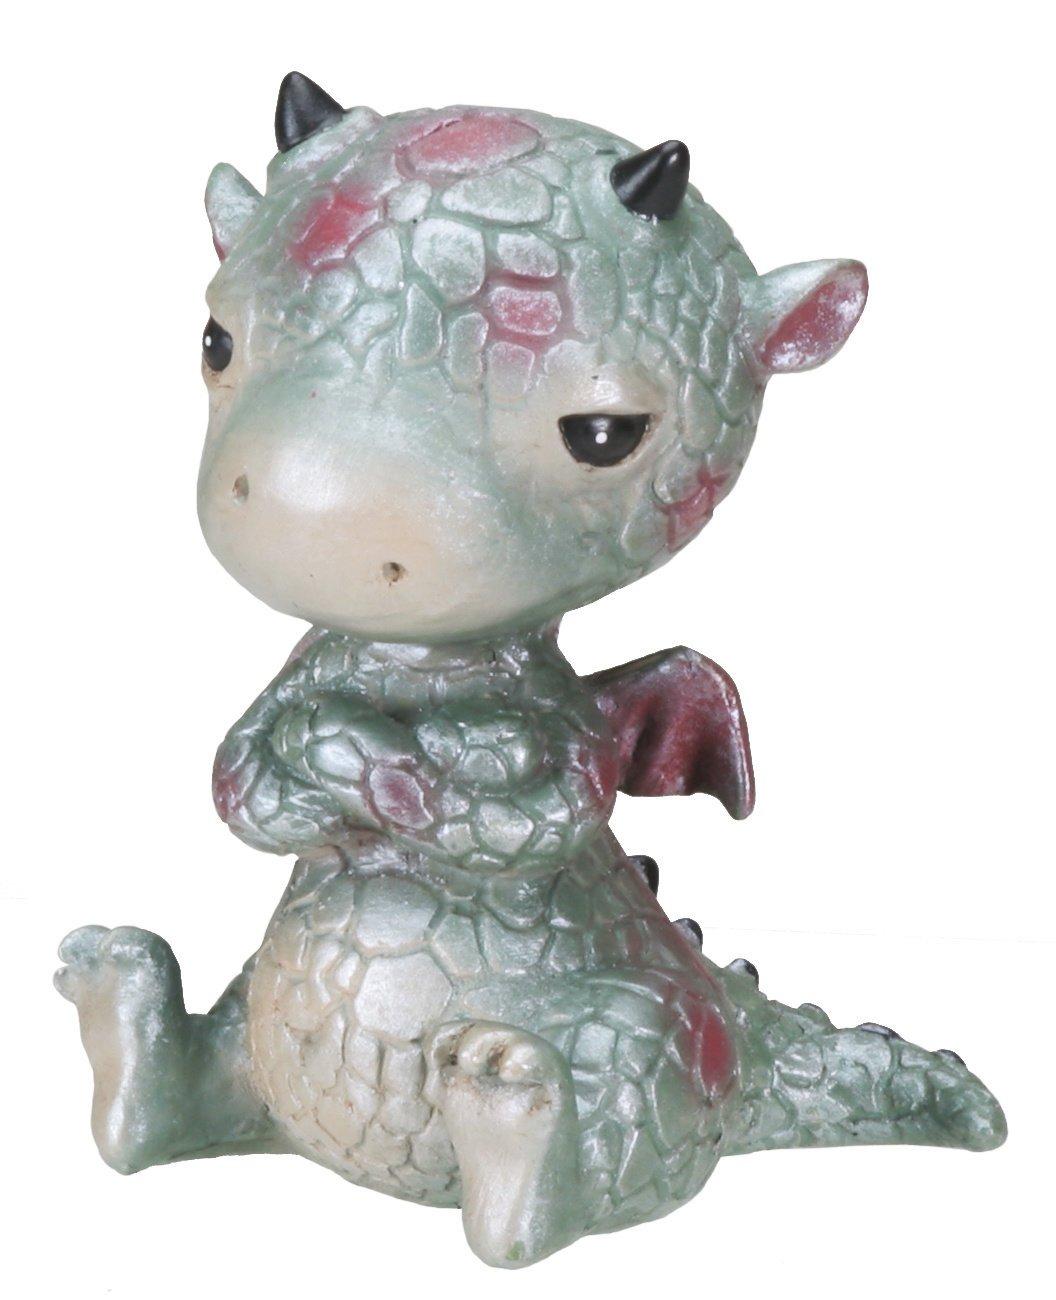 StealStreet Sulky Baby Dragon Figurine Display StealStreet (Home) SS-Y-7880